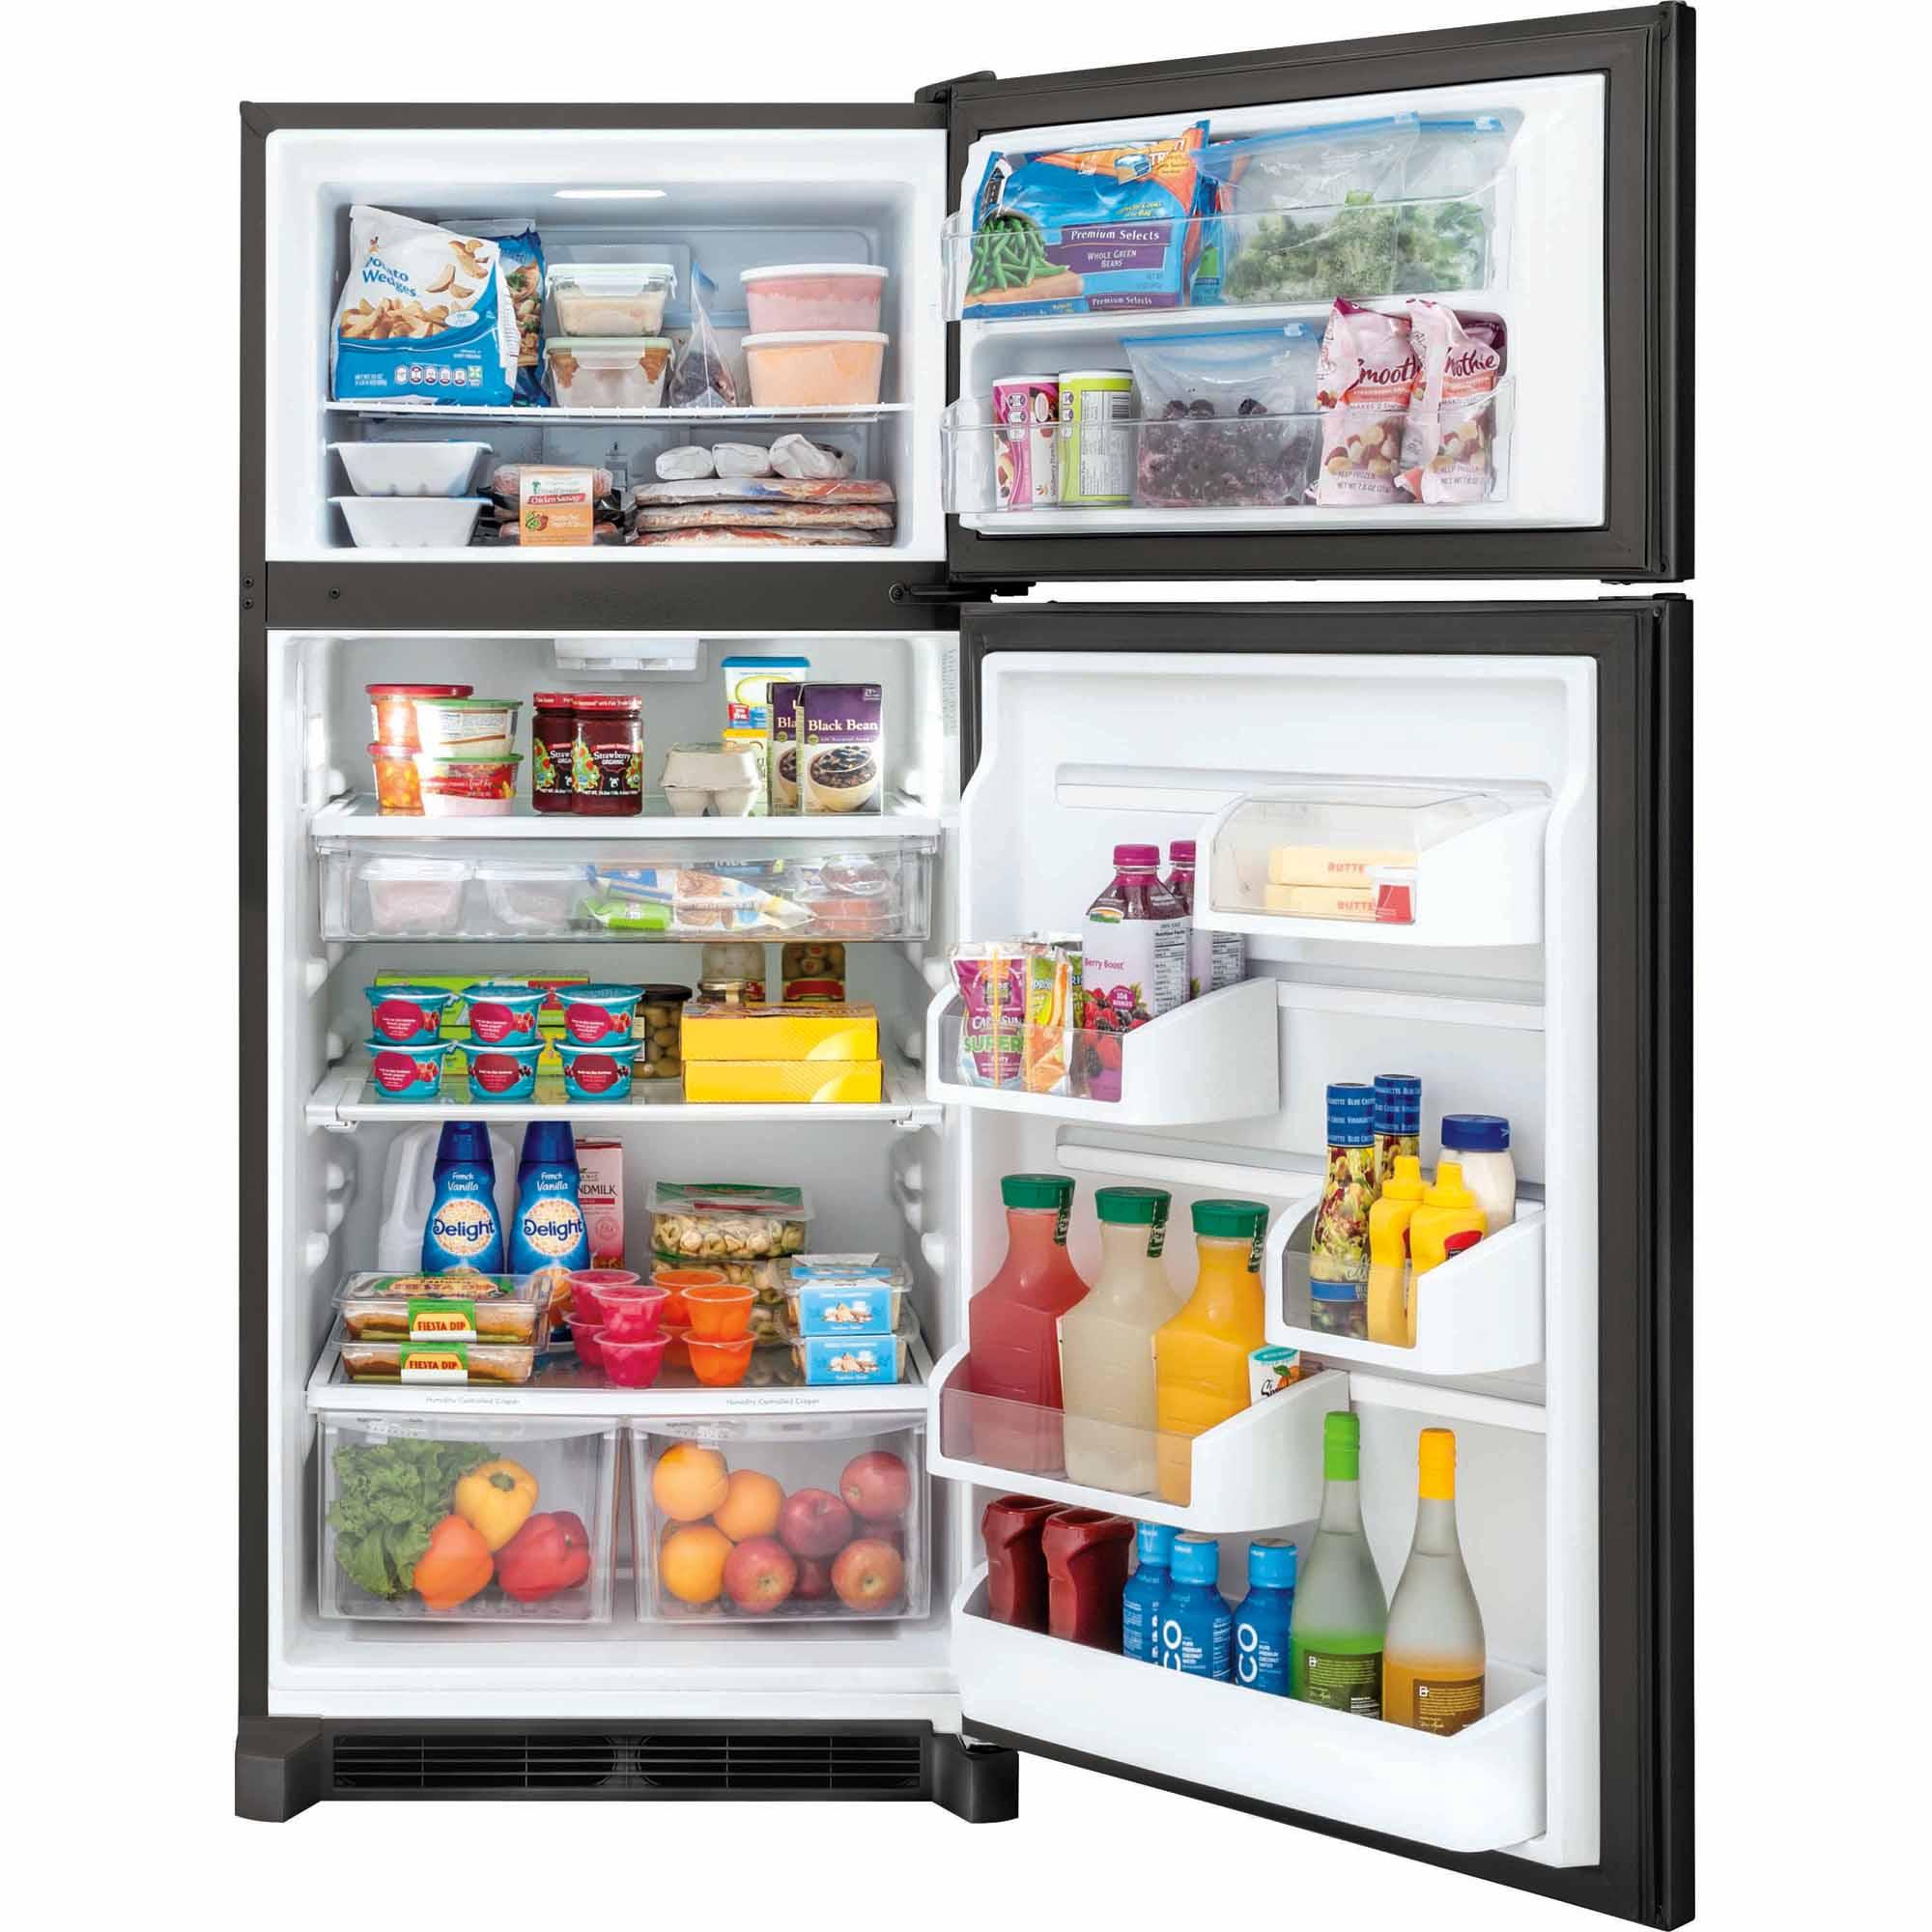 Frigidaire Gallery FGHT1846QE 18 cu. ft. Top Freezer Refrigerator - Black